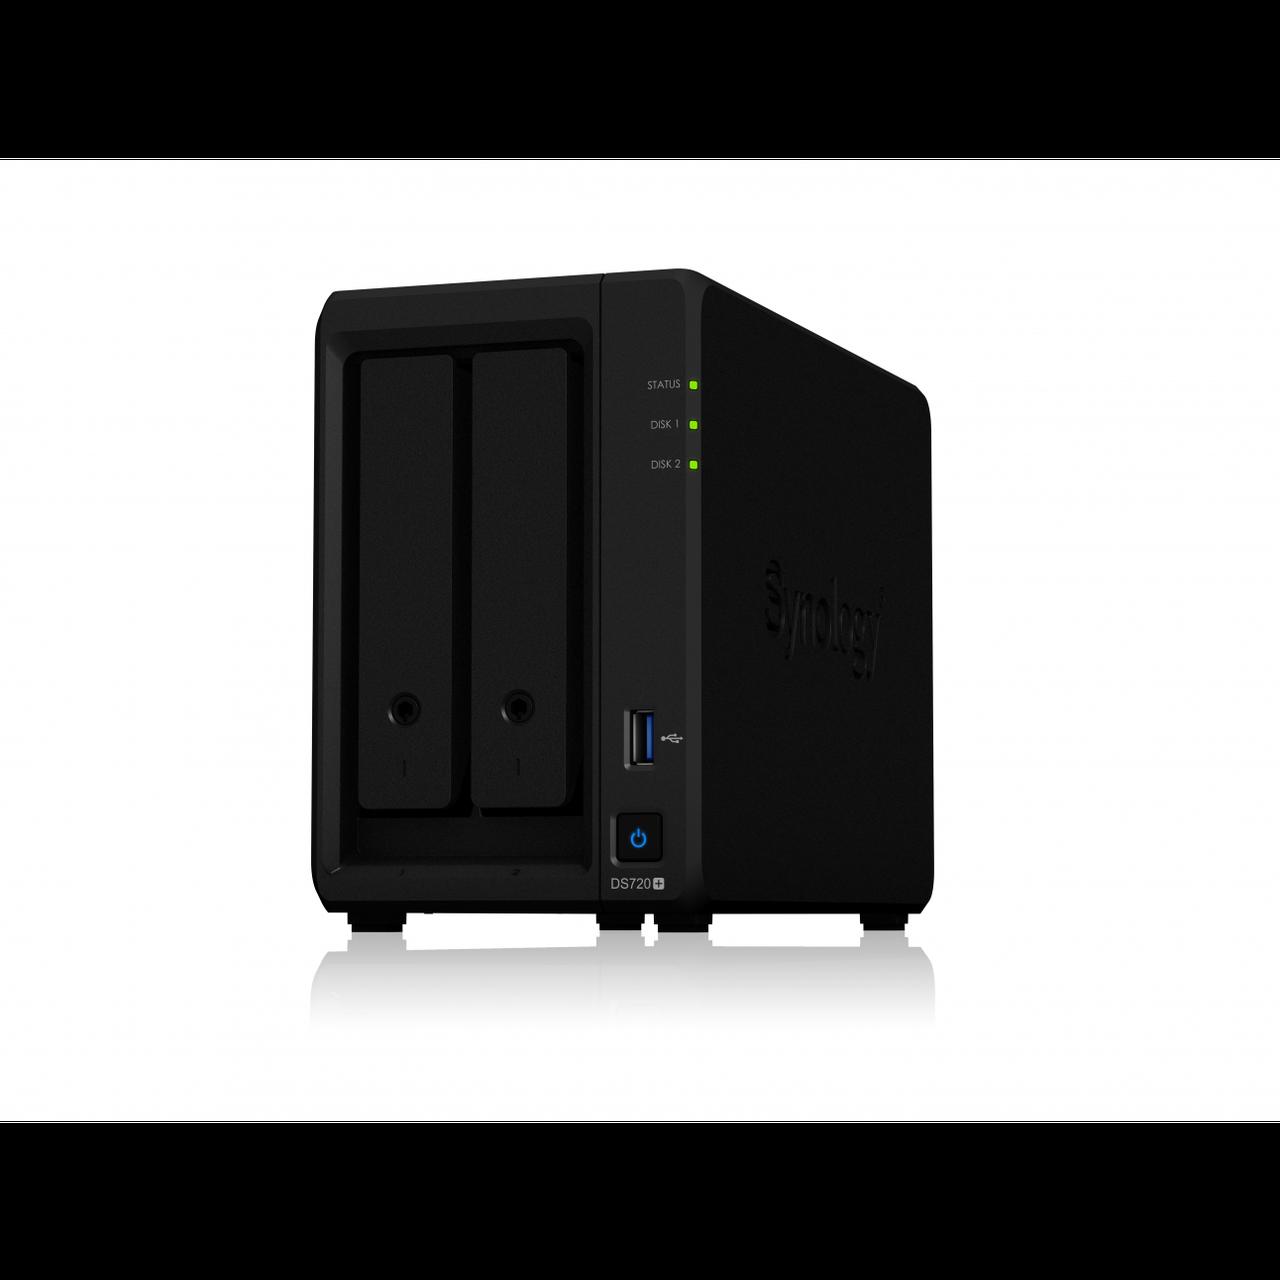 "Сетевое хранилище Synology DiskStation DS720+, 2xHDD 3,5"", 2х1000Base-T, без дисков"